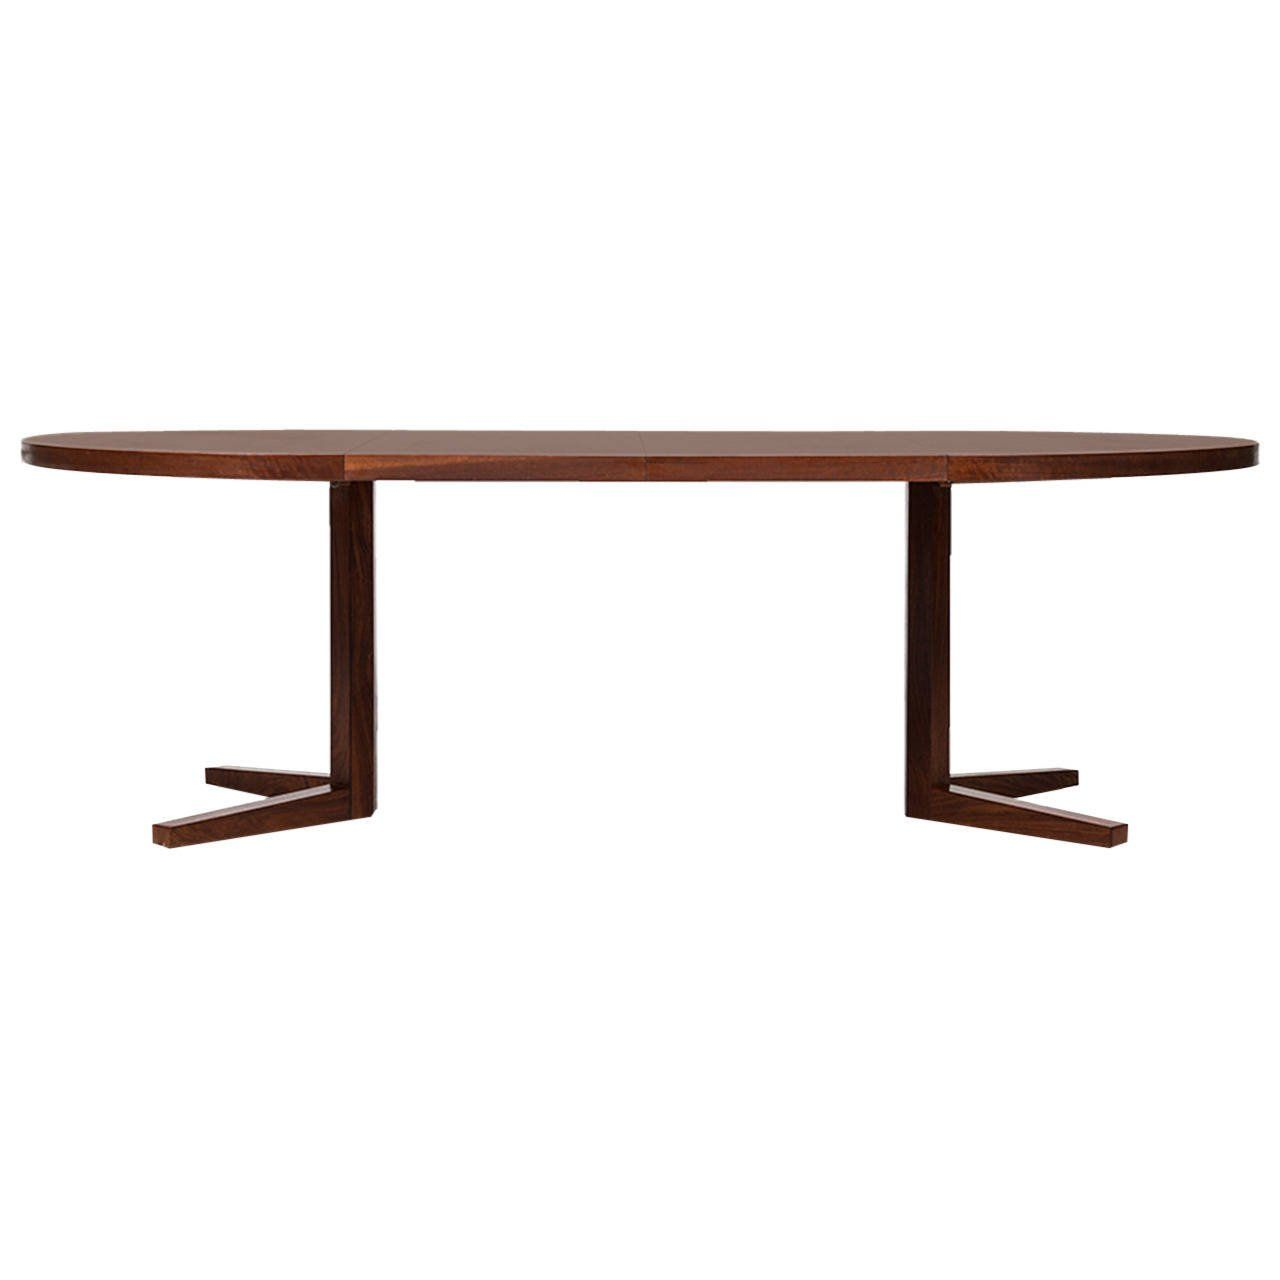 John Mortensen Dining Table In Rosewood By Heltborg Møbler